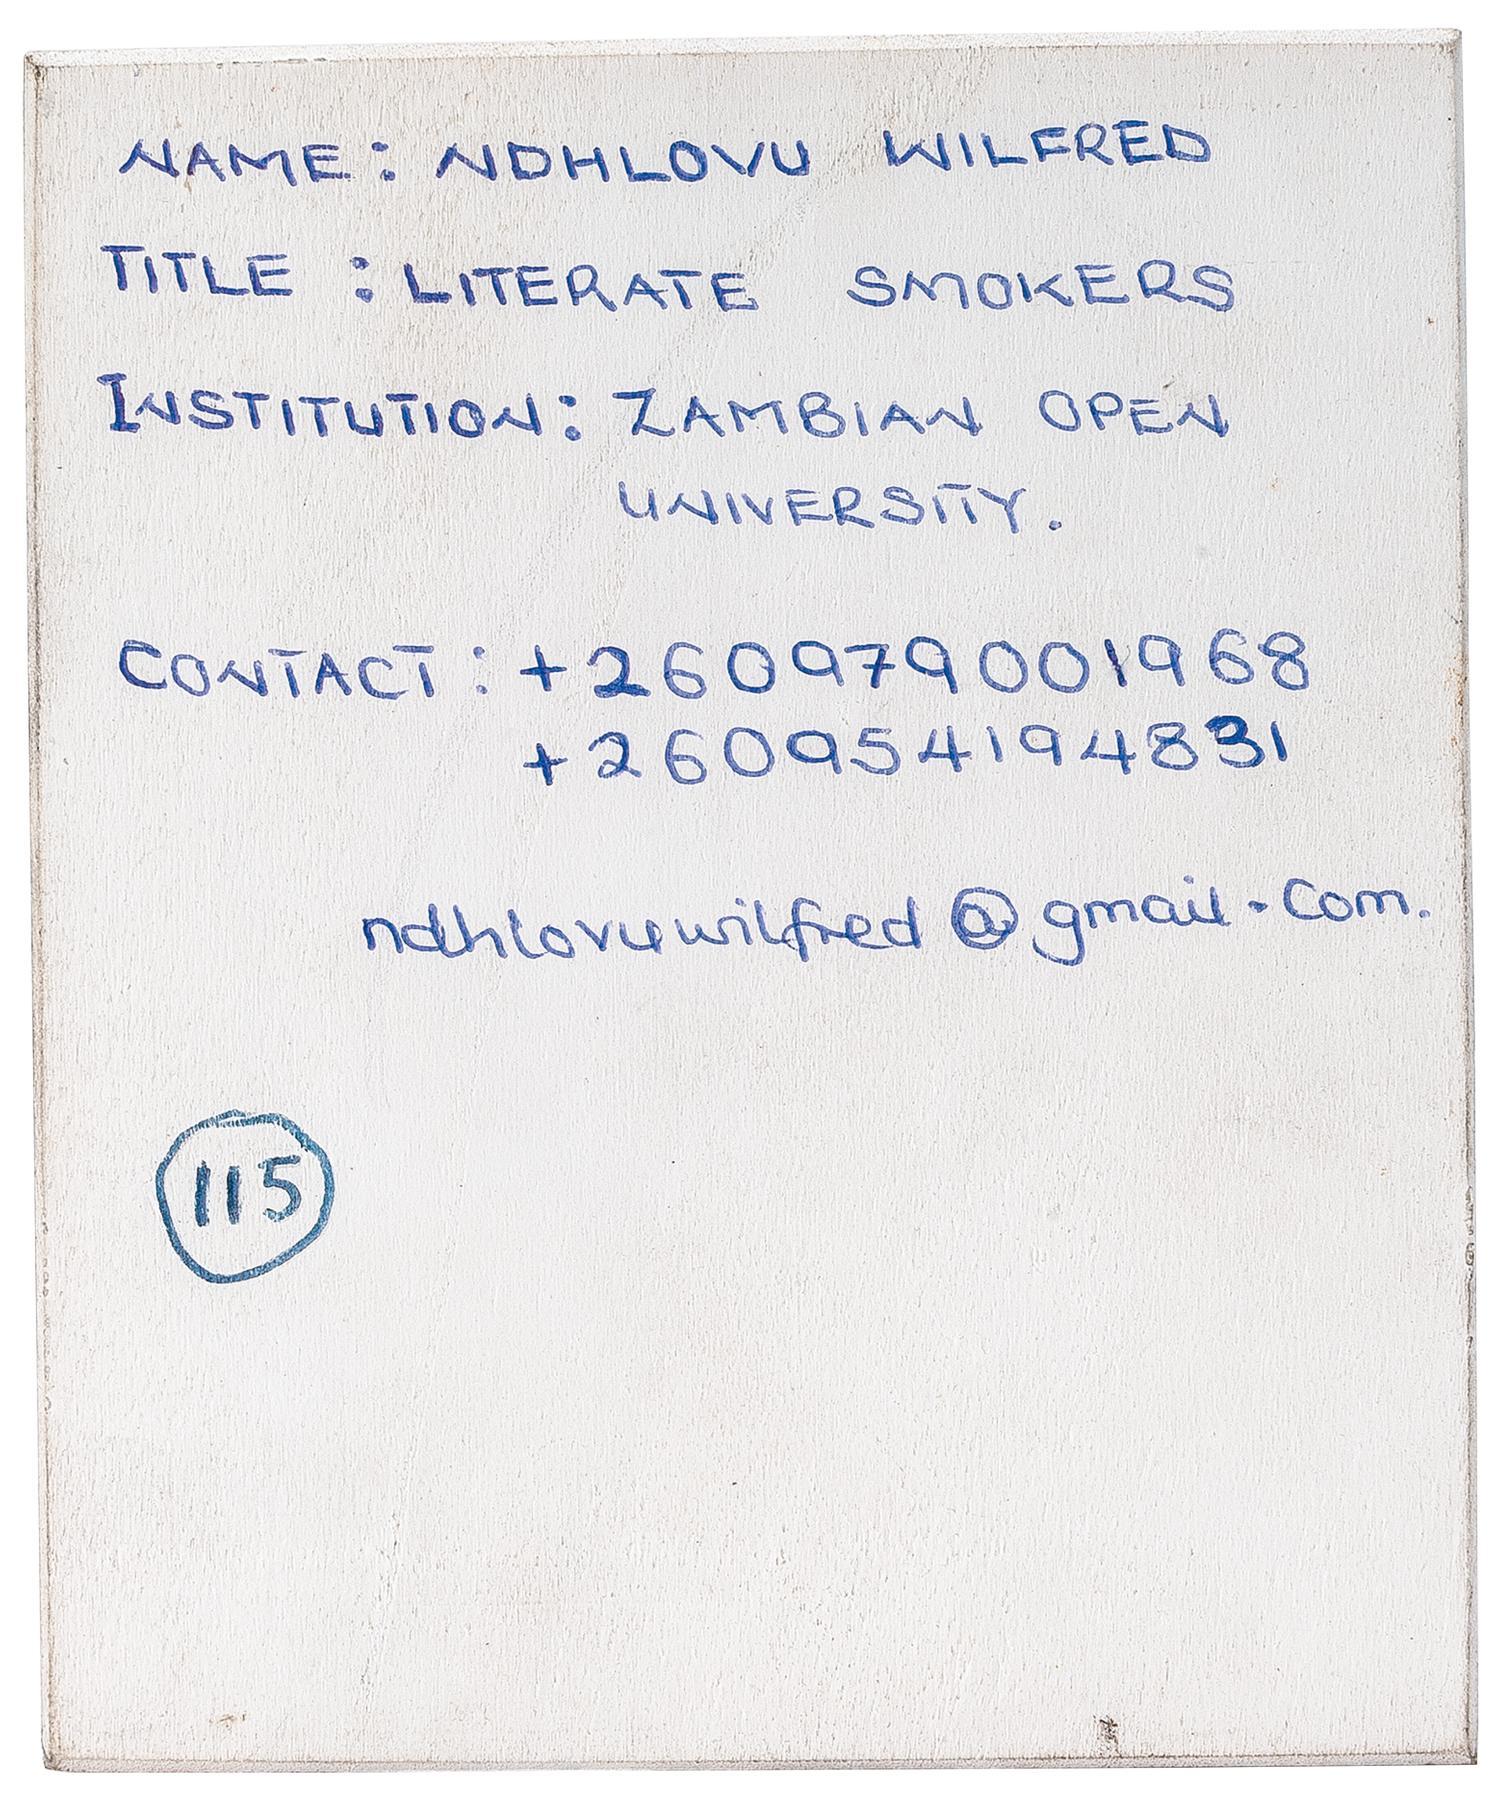 Imago Mundi Literate Smokers By Wilfred Ndhlovu